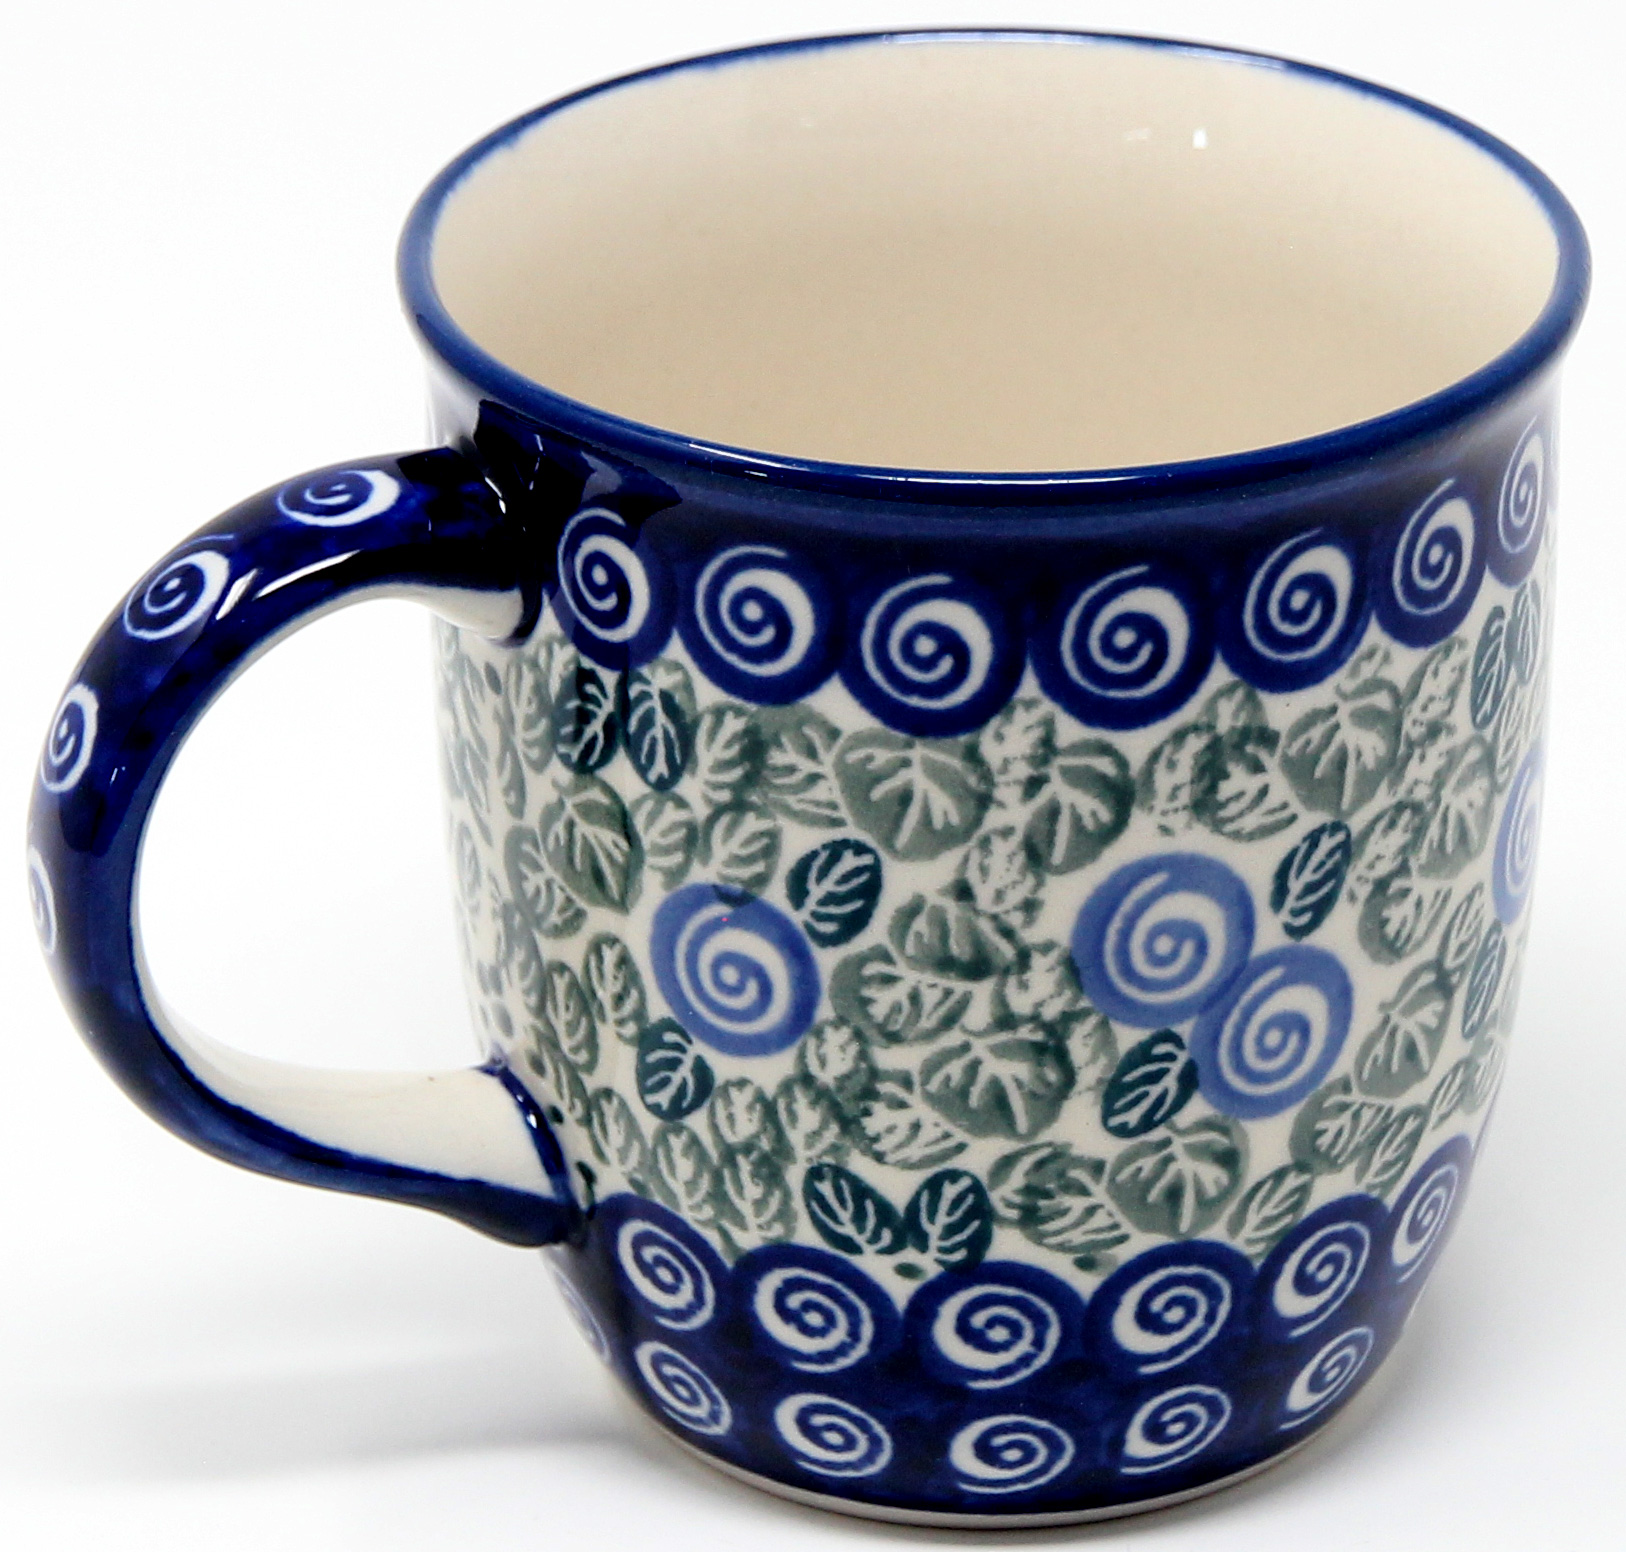 Mug 12 Oz Polish Pottery From Zaklady Boleslawiec 1073a Classic Pattern 12 Ounce Mugs Polish Pottery Mugs Polish Pottery Market